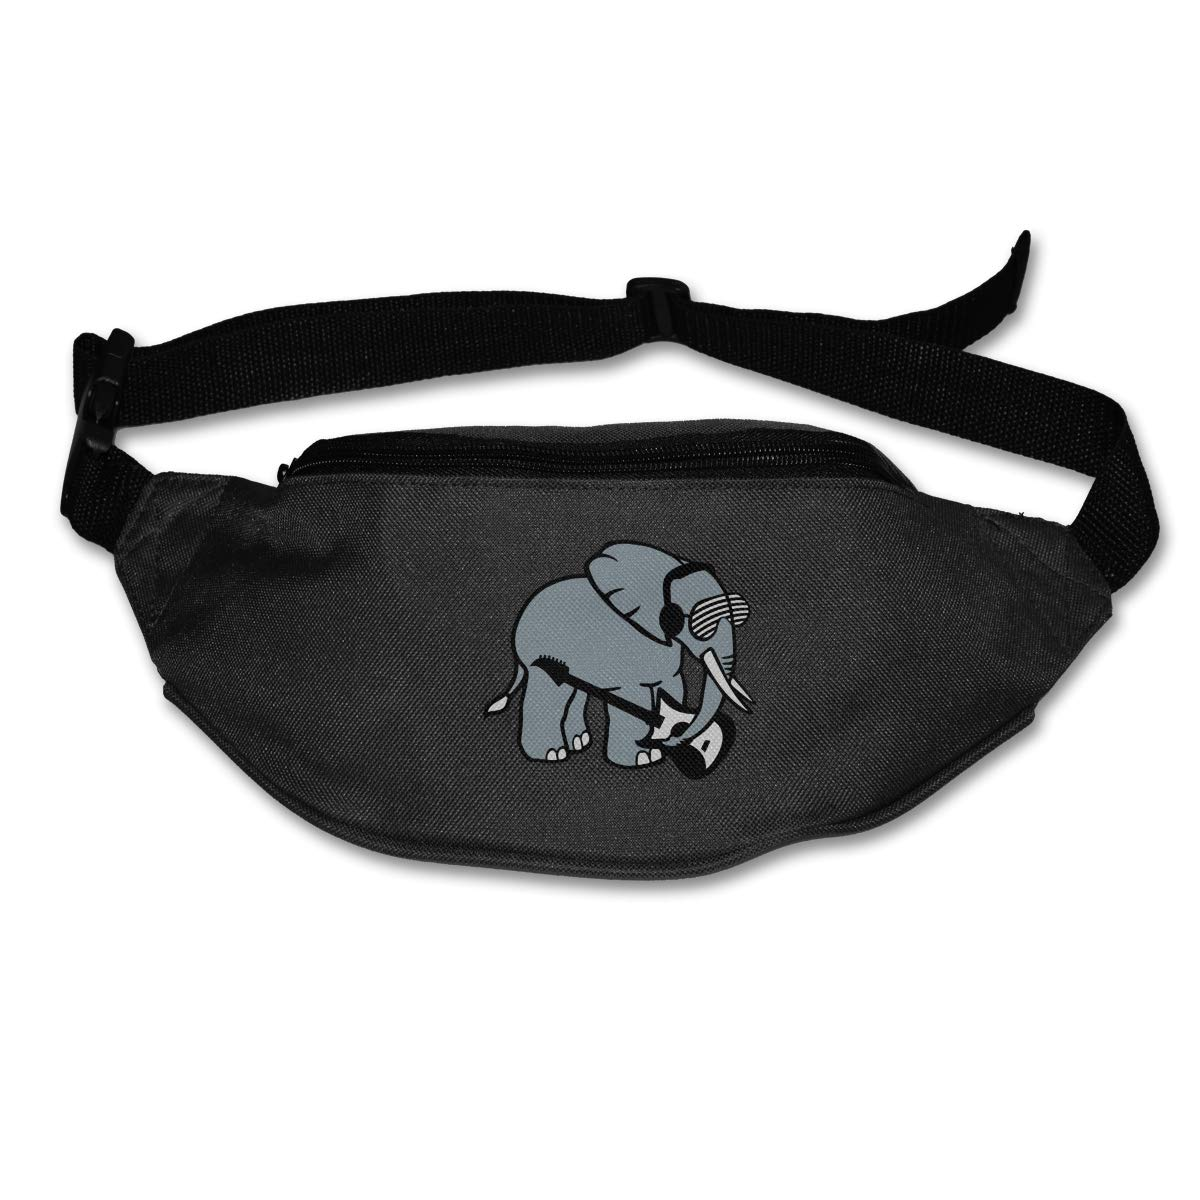 Elephant With Glasses Guitar Sport Waist Bag Fanny Pack Adjustable For Travel